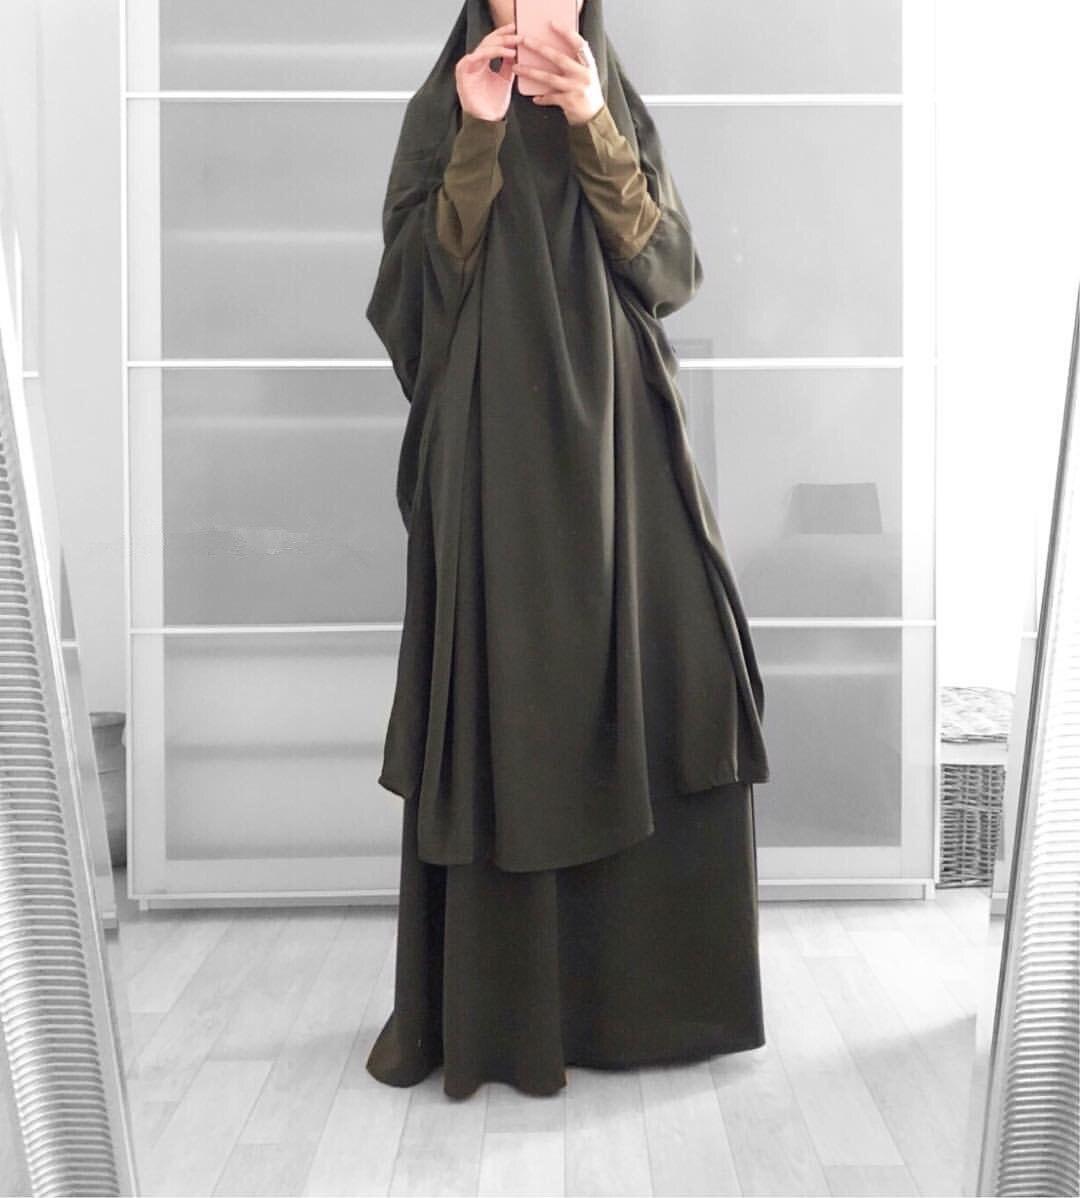 Ramadan Aid Moubarak Abaya Dubai Turkey Islam Prayer Muslim Fashion Hijab Dress Sets for Women Djellaba Ensemble Femme Musulmane